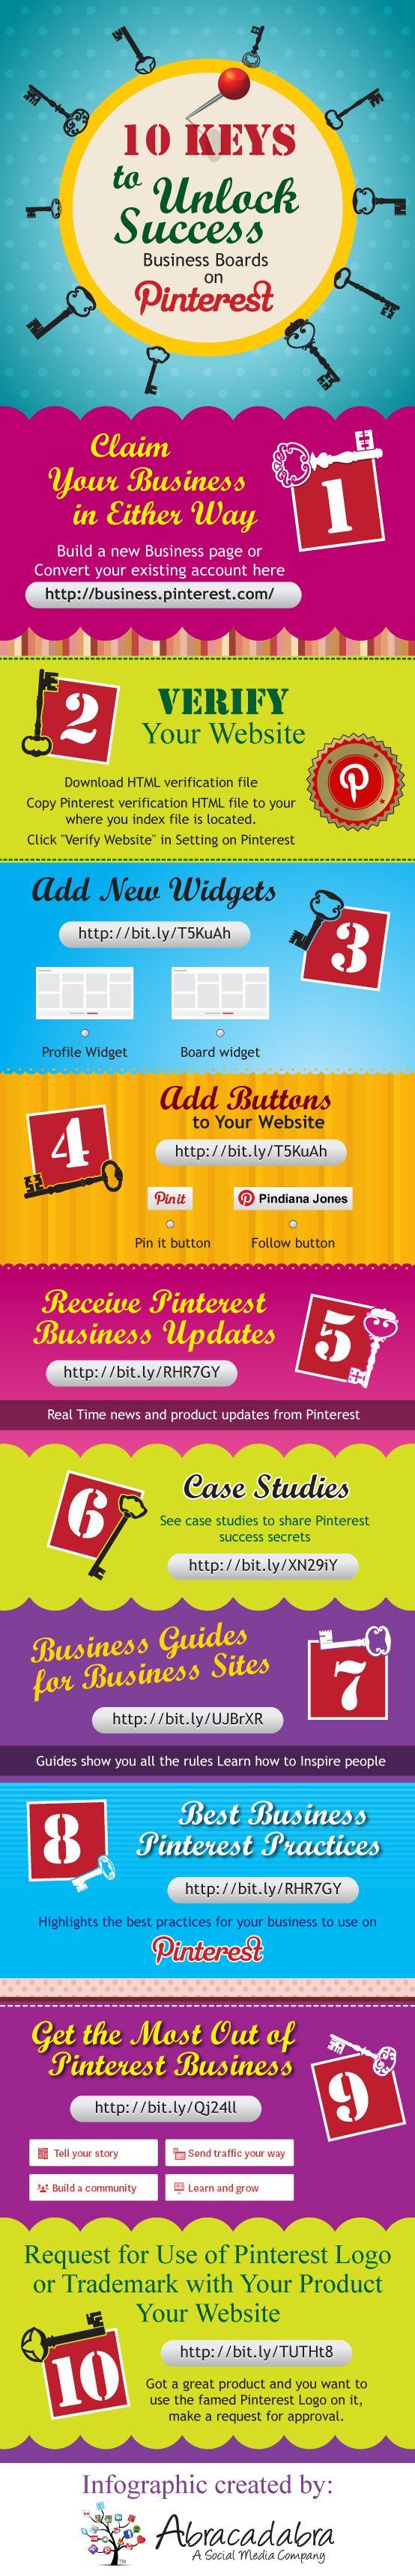 10 Keys to Unlock Success on New Business Boards by abracadabrasocialmedia.com